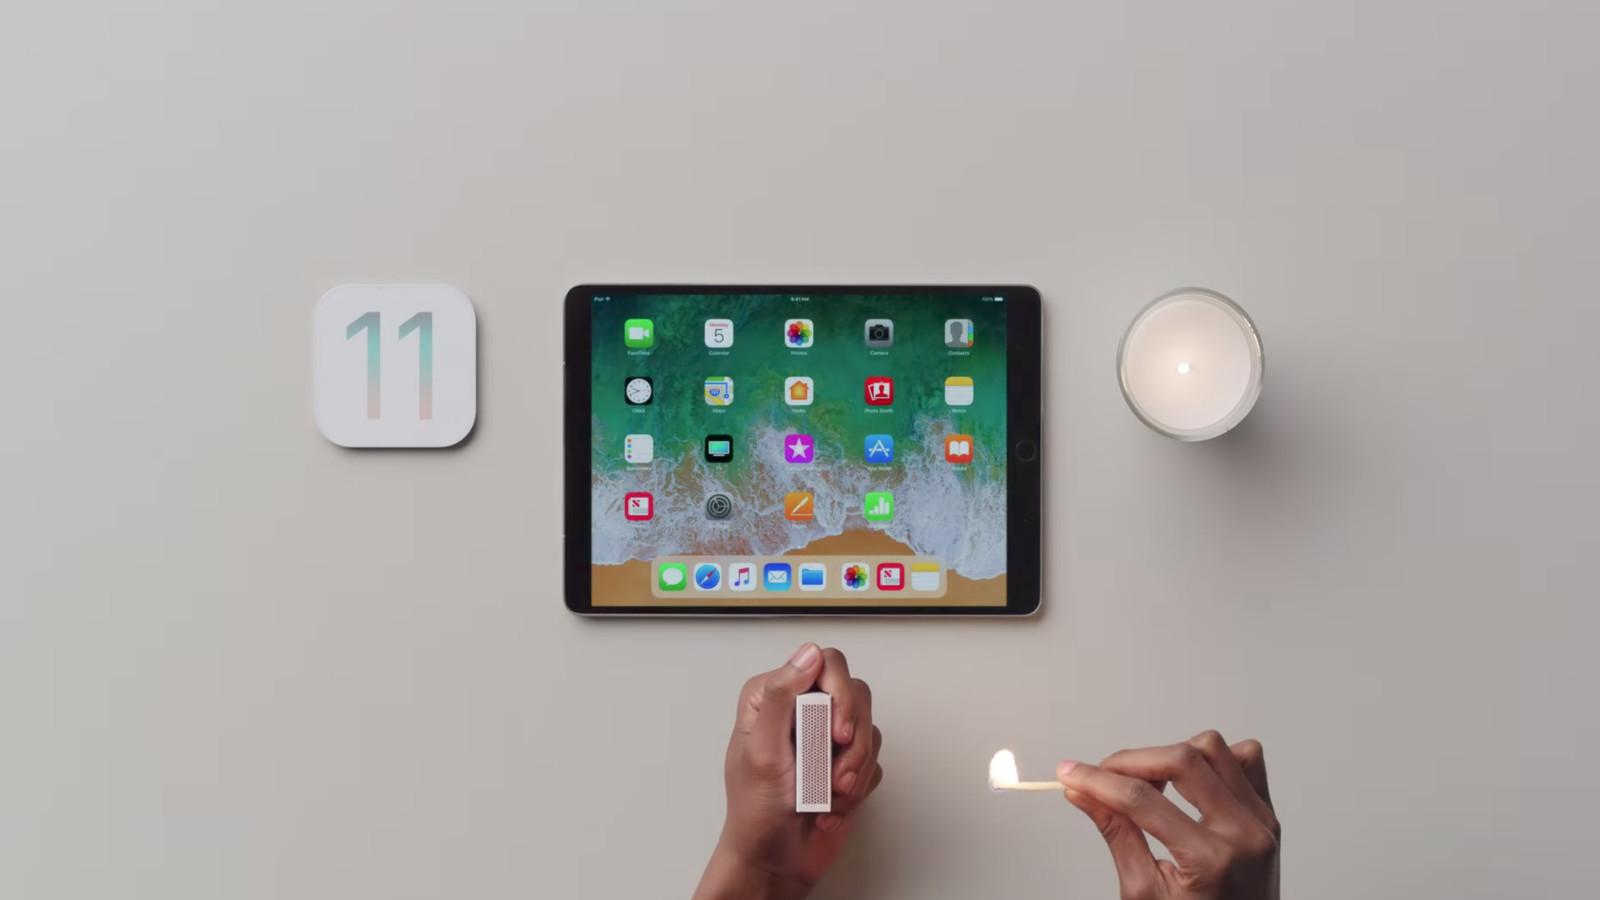 Apple hypes iOS 11 with new iPad Pro videos